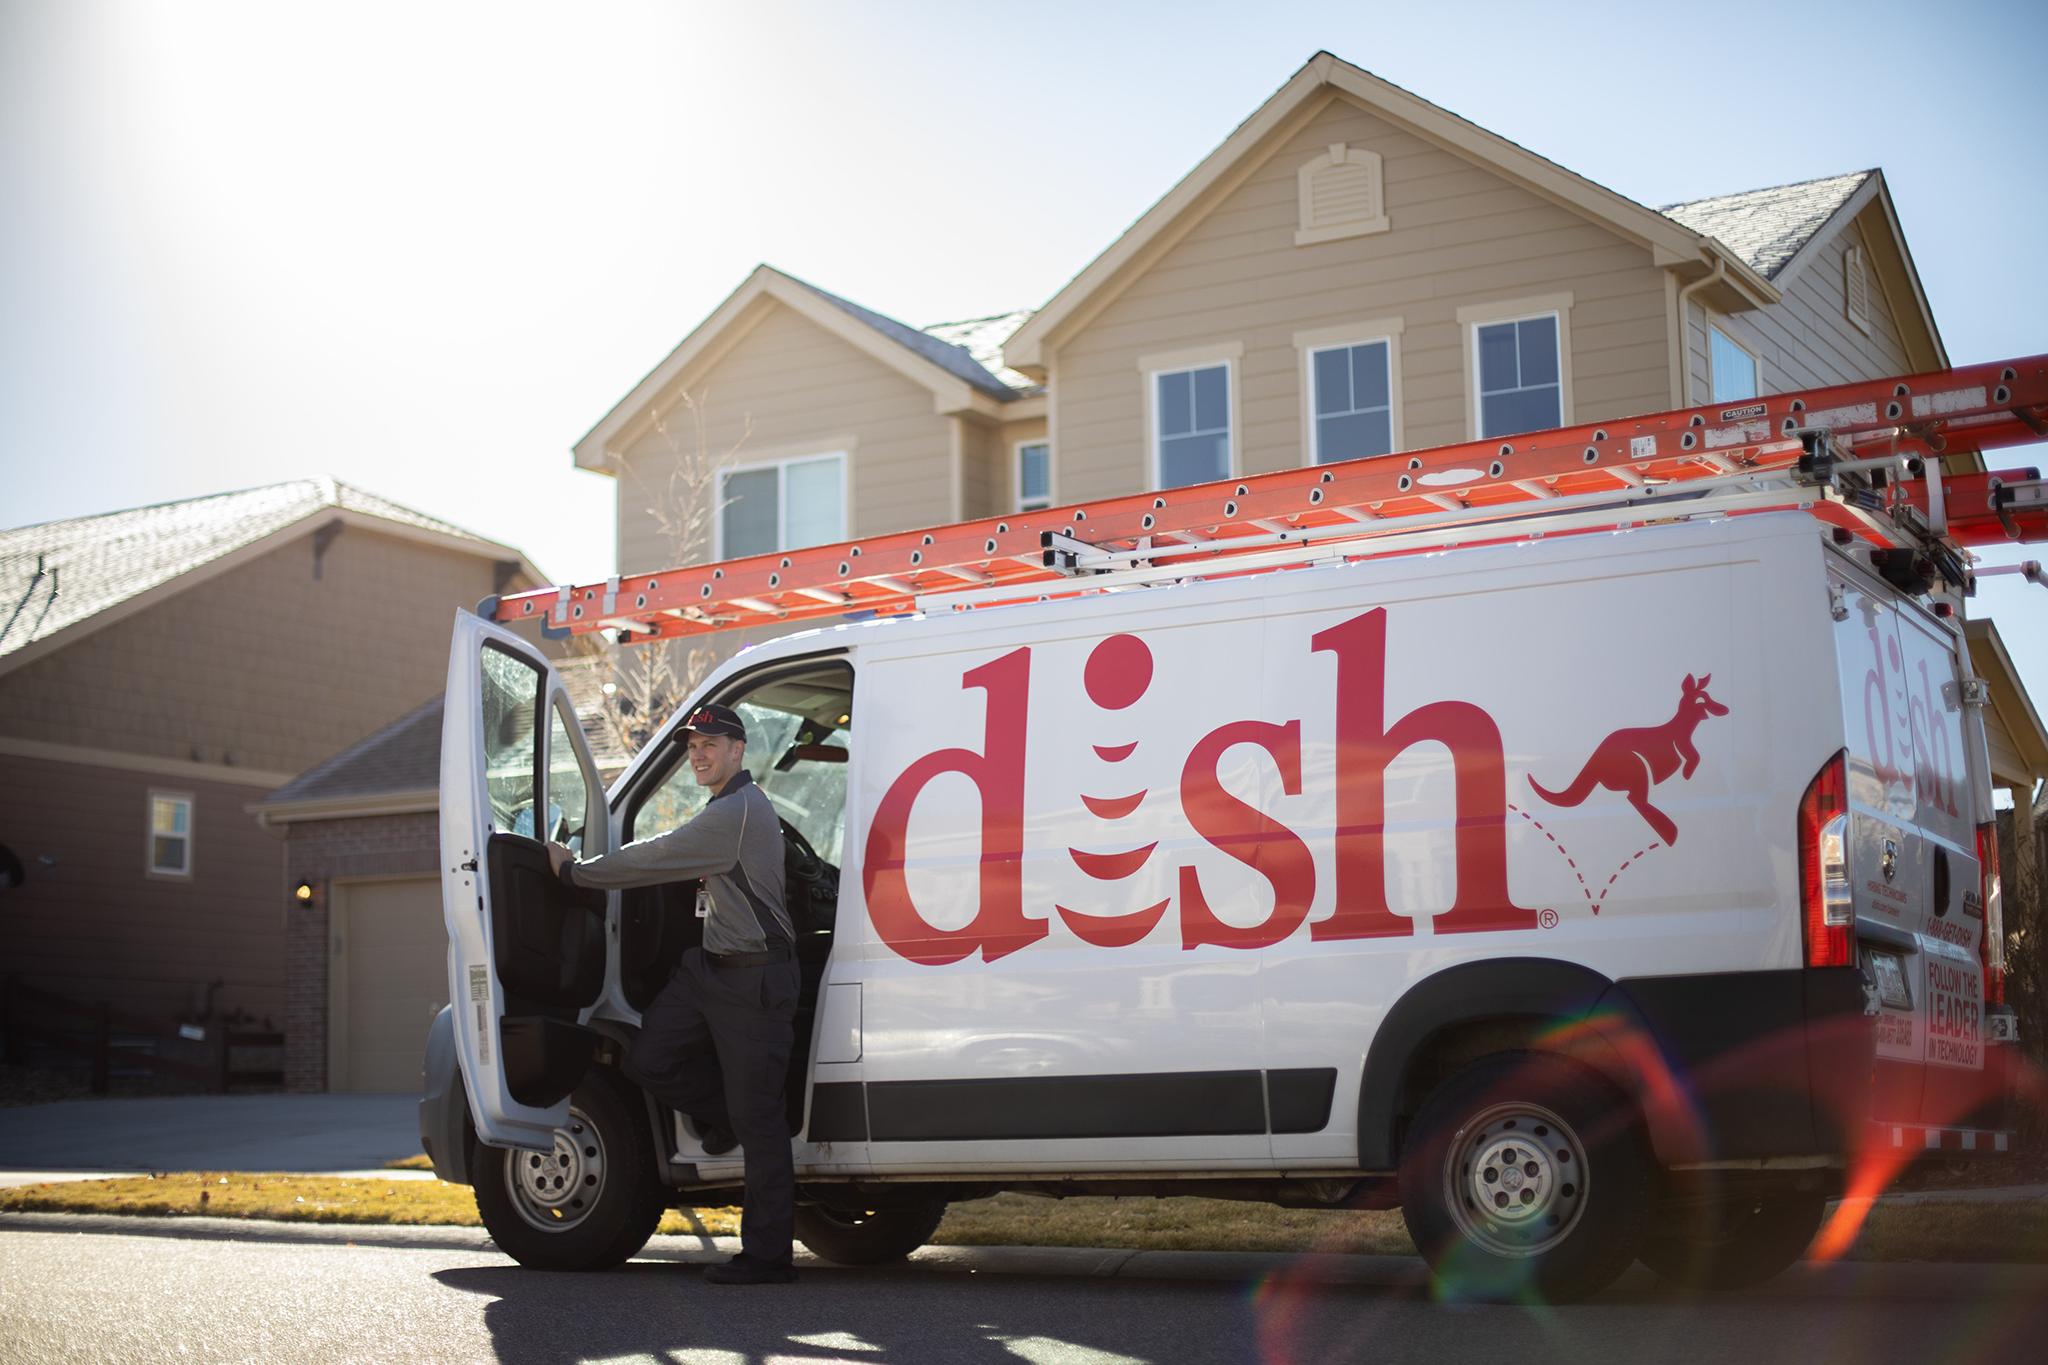 Dish Van